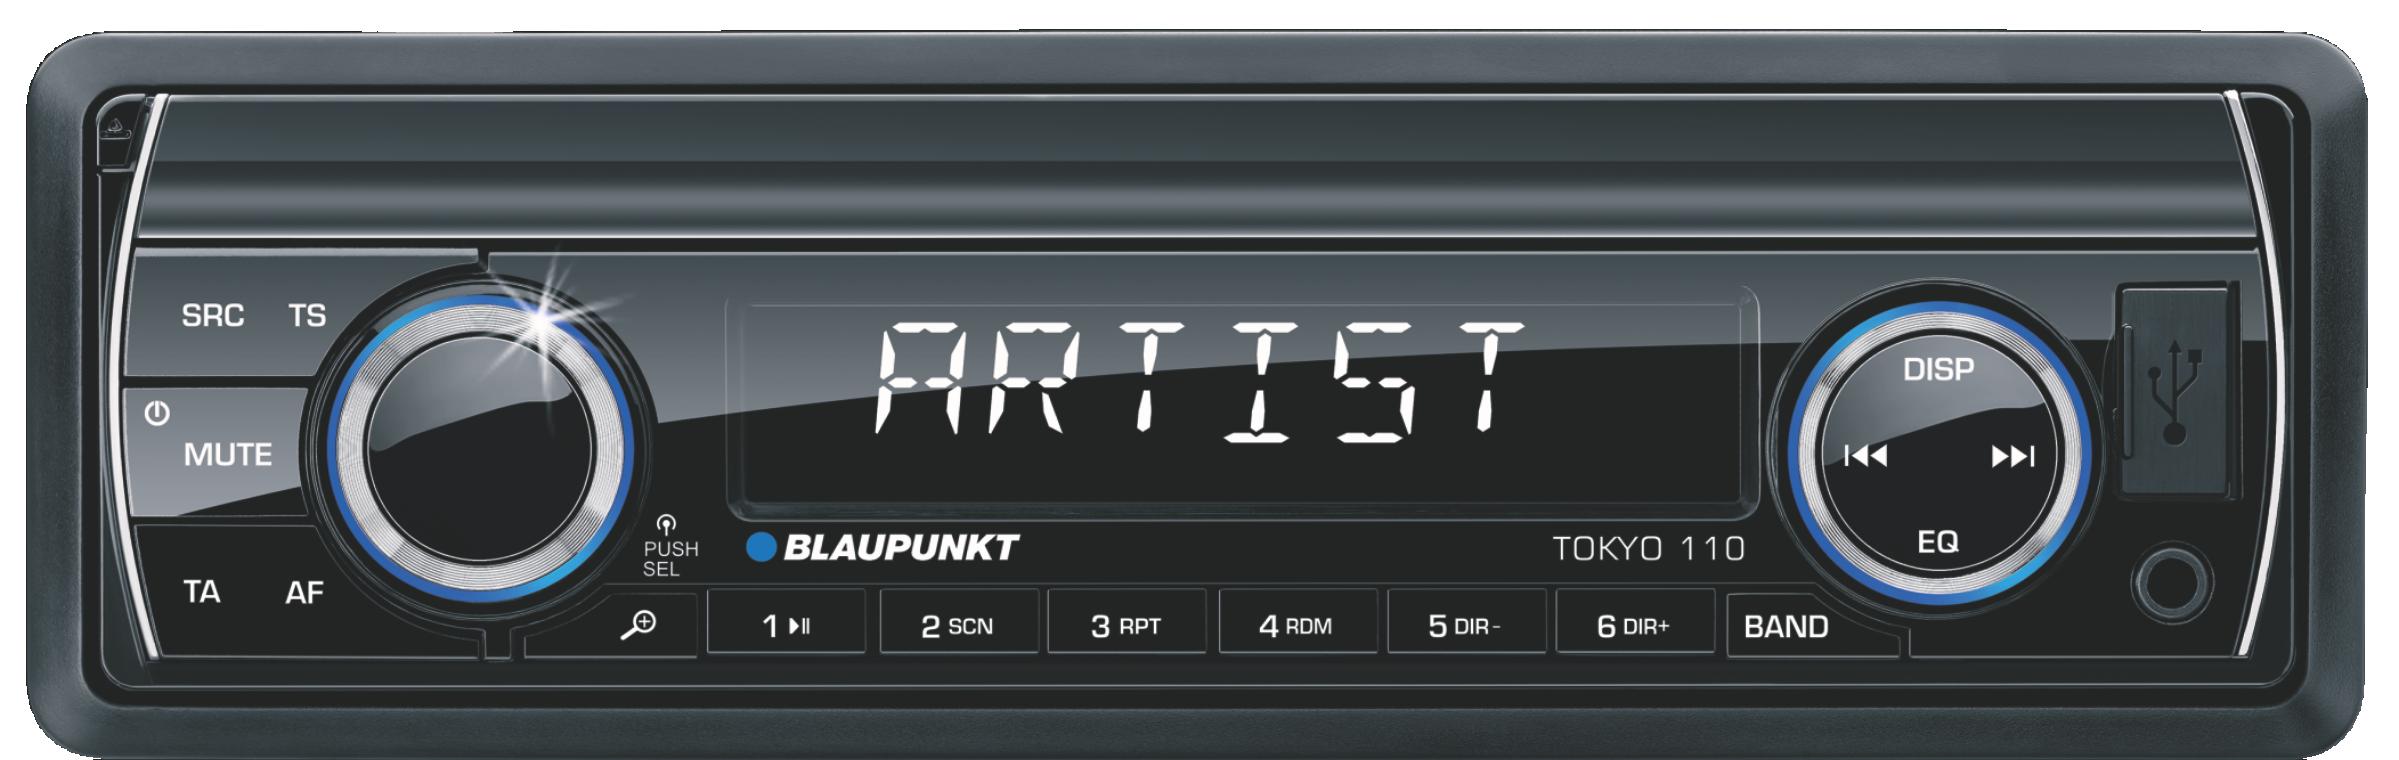 Blaupunkt TOKYO 110 FM SD USB PANEL automagnetola